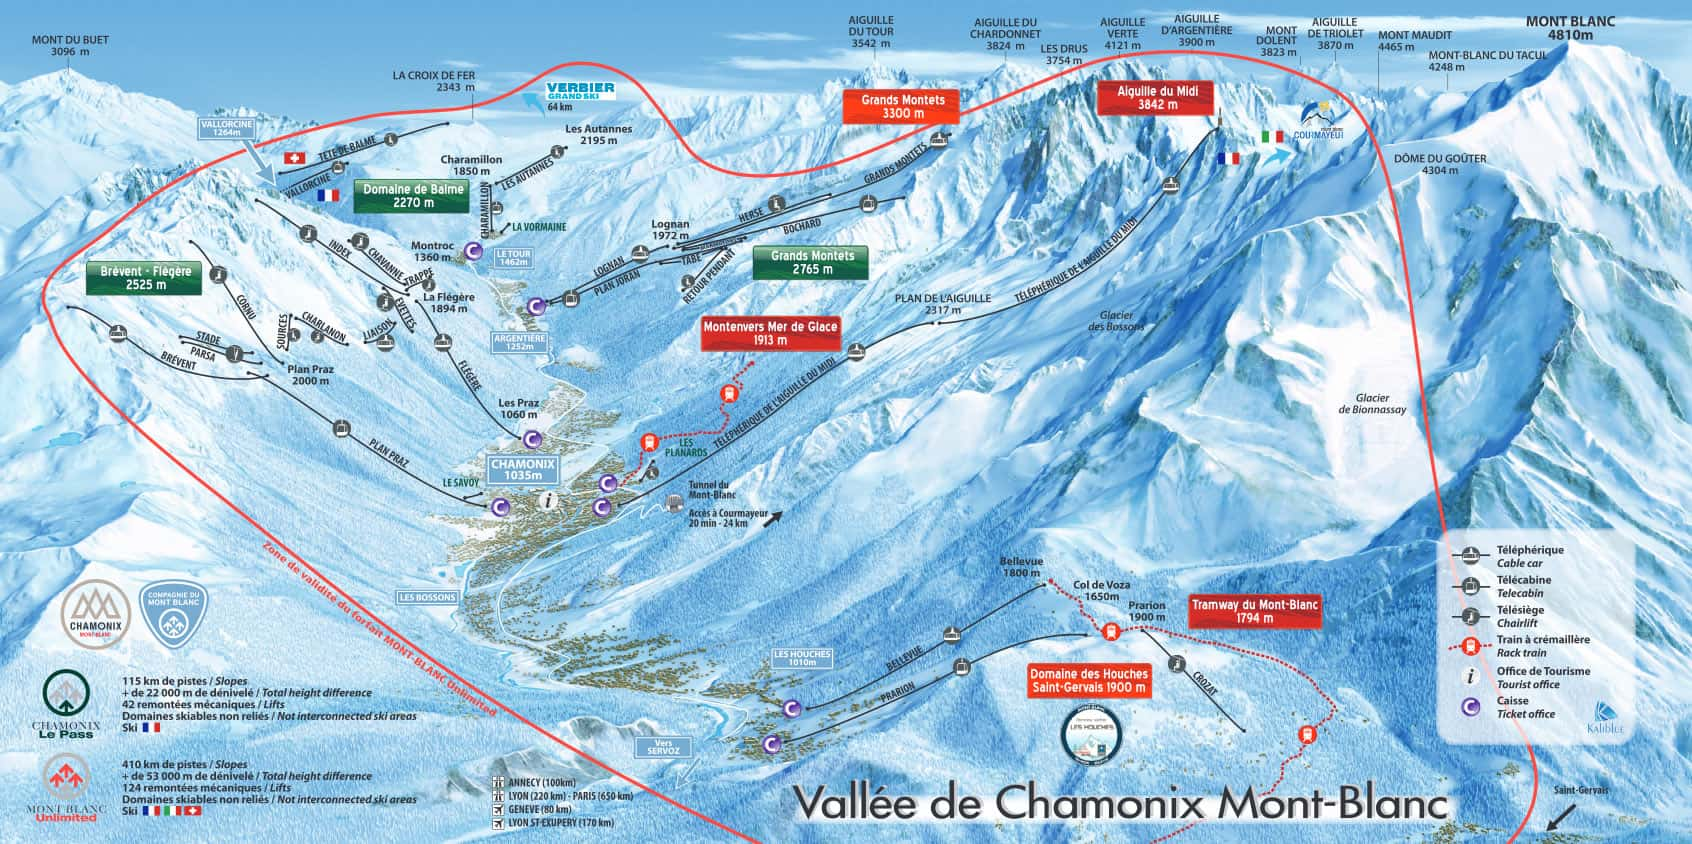 Chamonix JPG